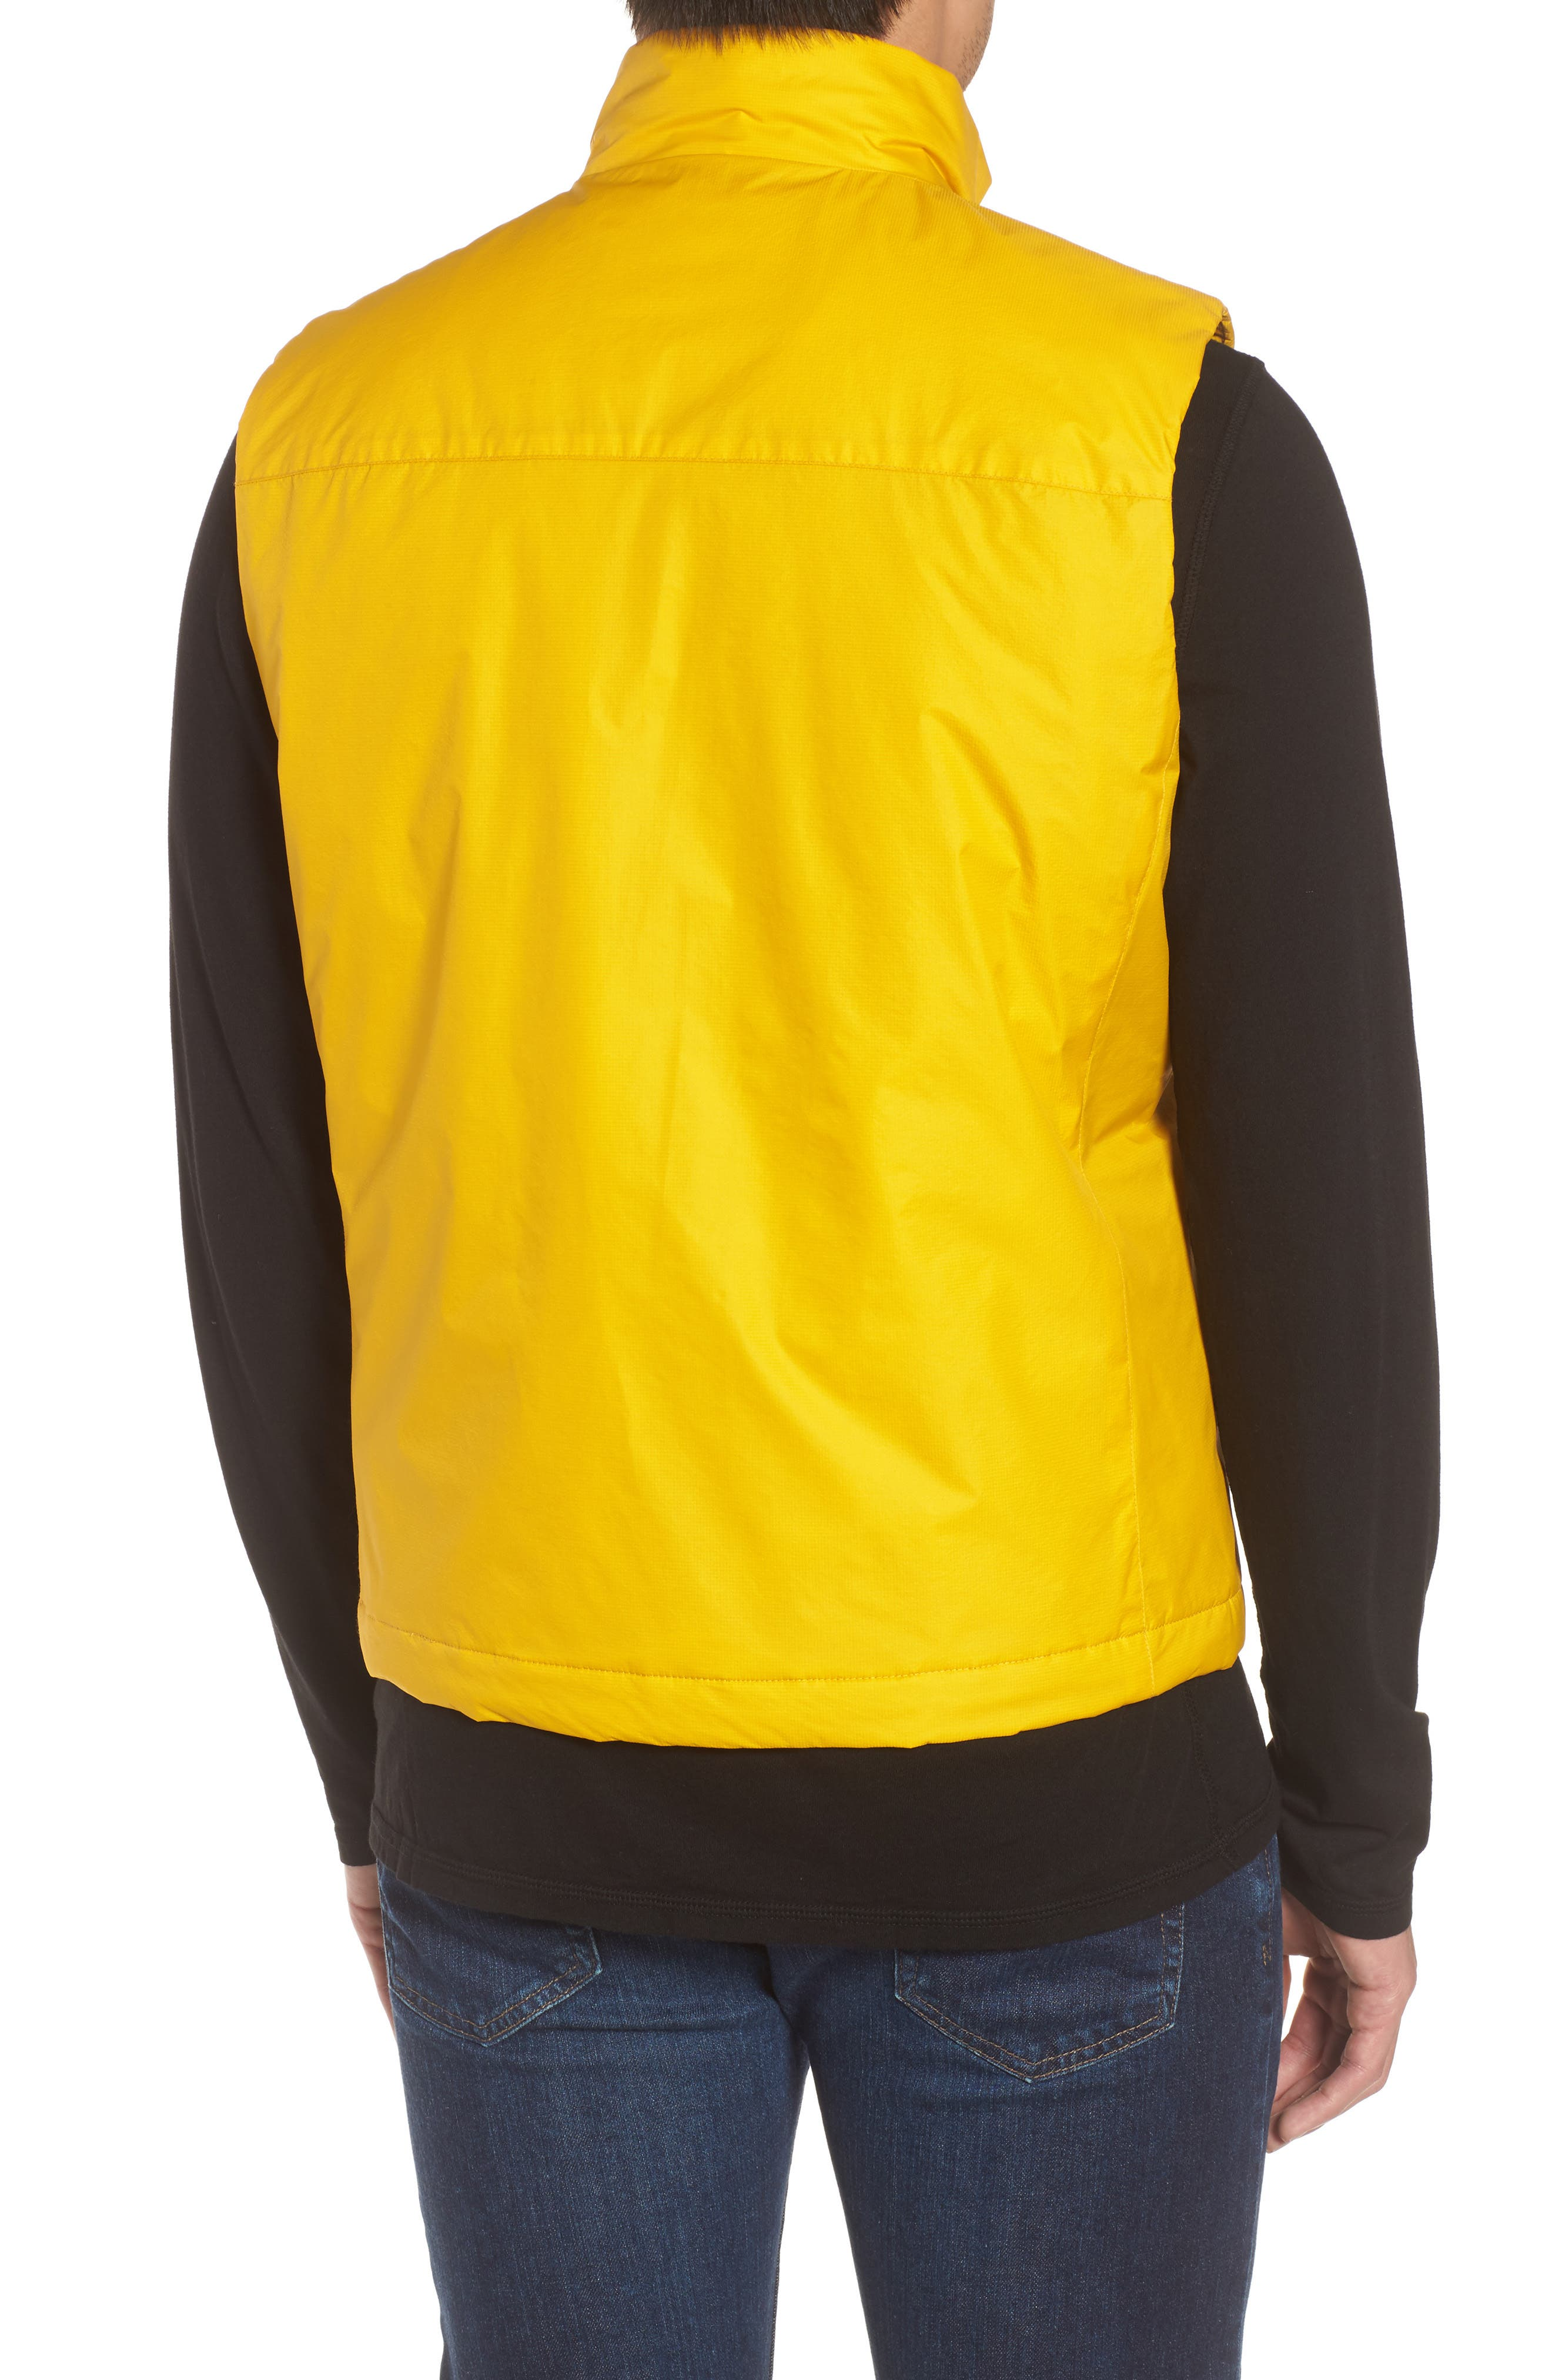 & Bros. Bering Vest,                             Alternate thumbnail 2, color,                             700